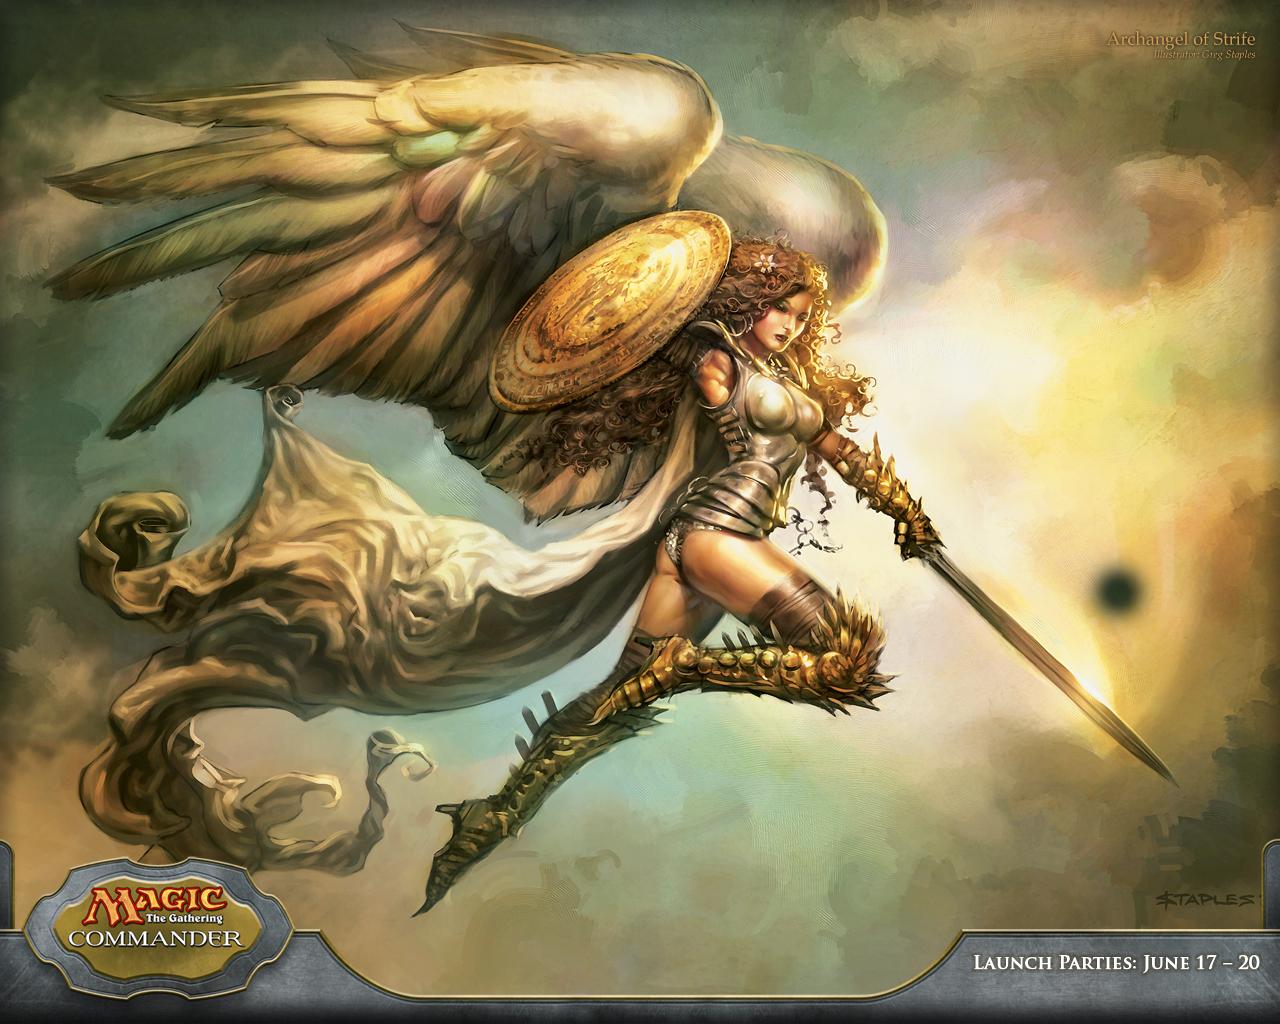 Warrior Fantasy Art Armor Angel Magic Wallpapers Hd: Wallpaper Of The Week: Archangel Of Strife